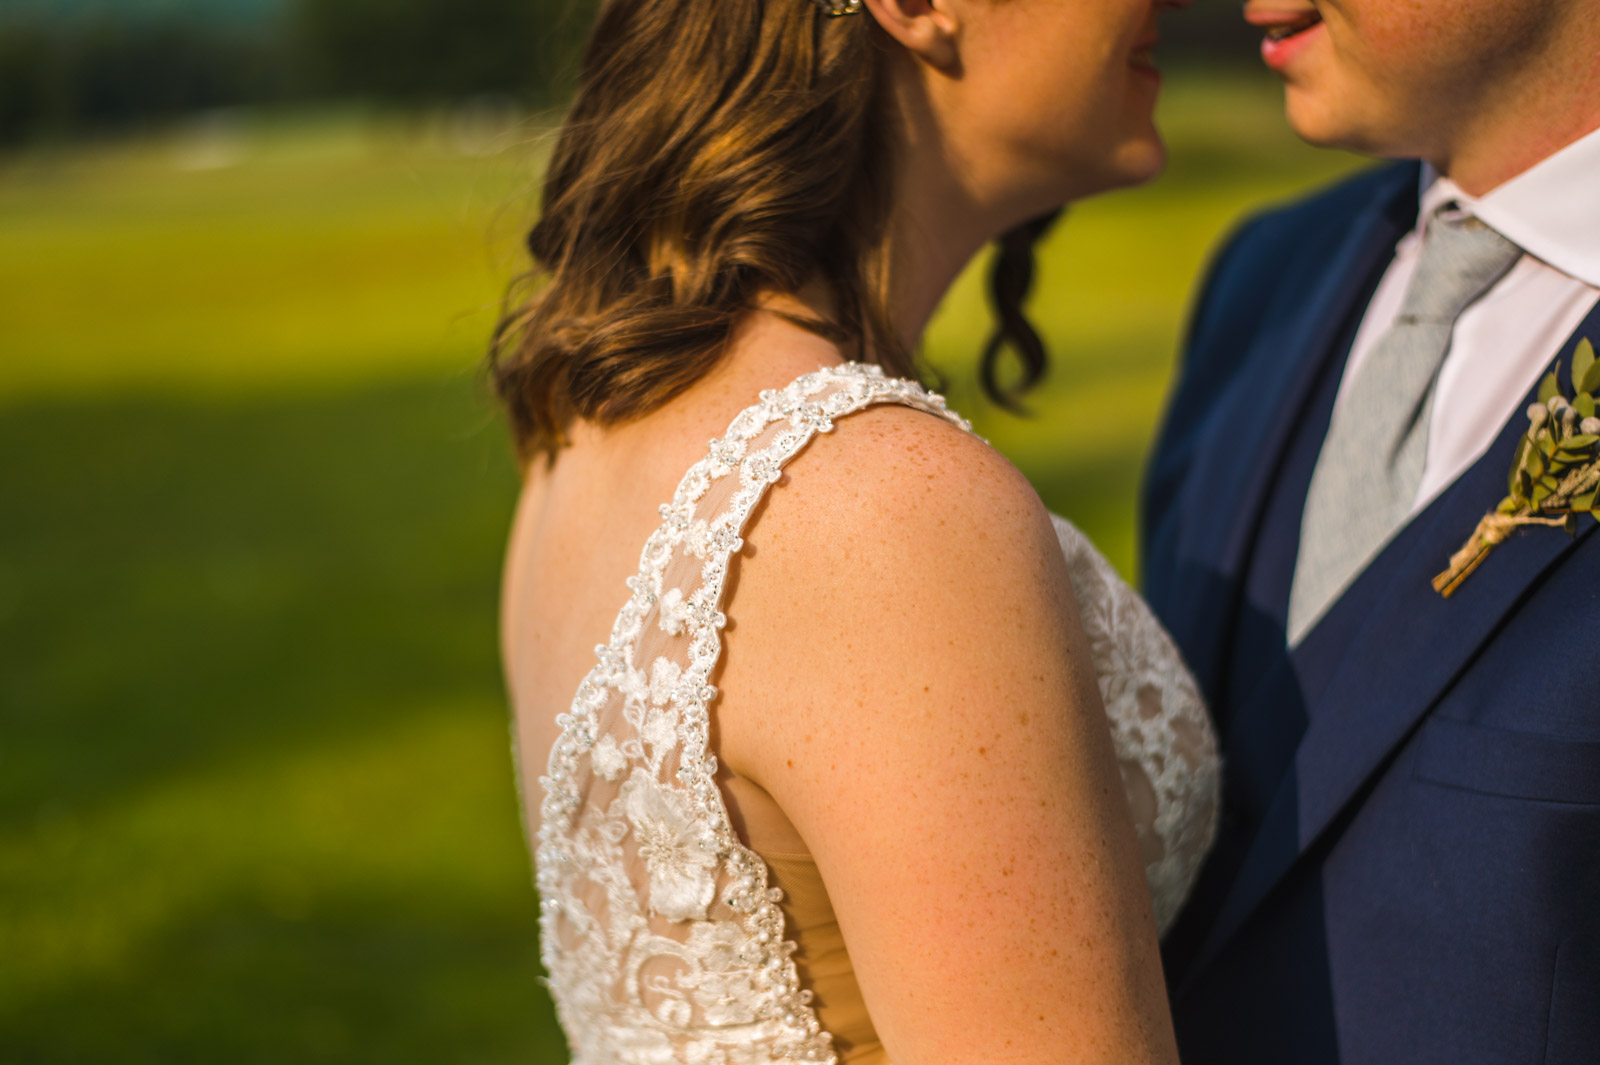 Emerson & Elicia's Golf Course Wedding Aidan & Leanne Hennebry Hamilton Wedding Videographers Photographers Niagara Hush Hush Photography & Film-53.jpg